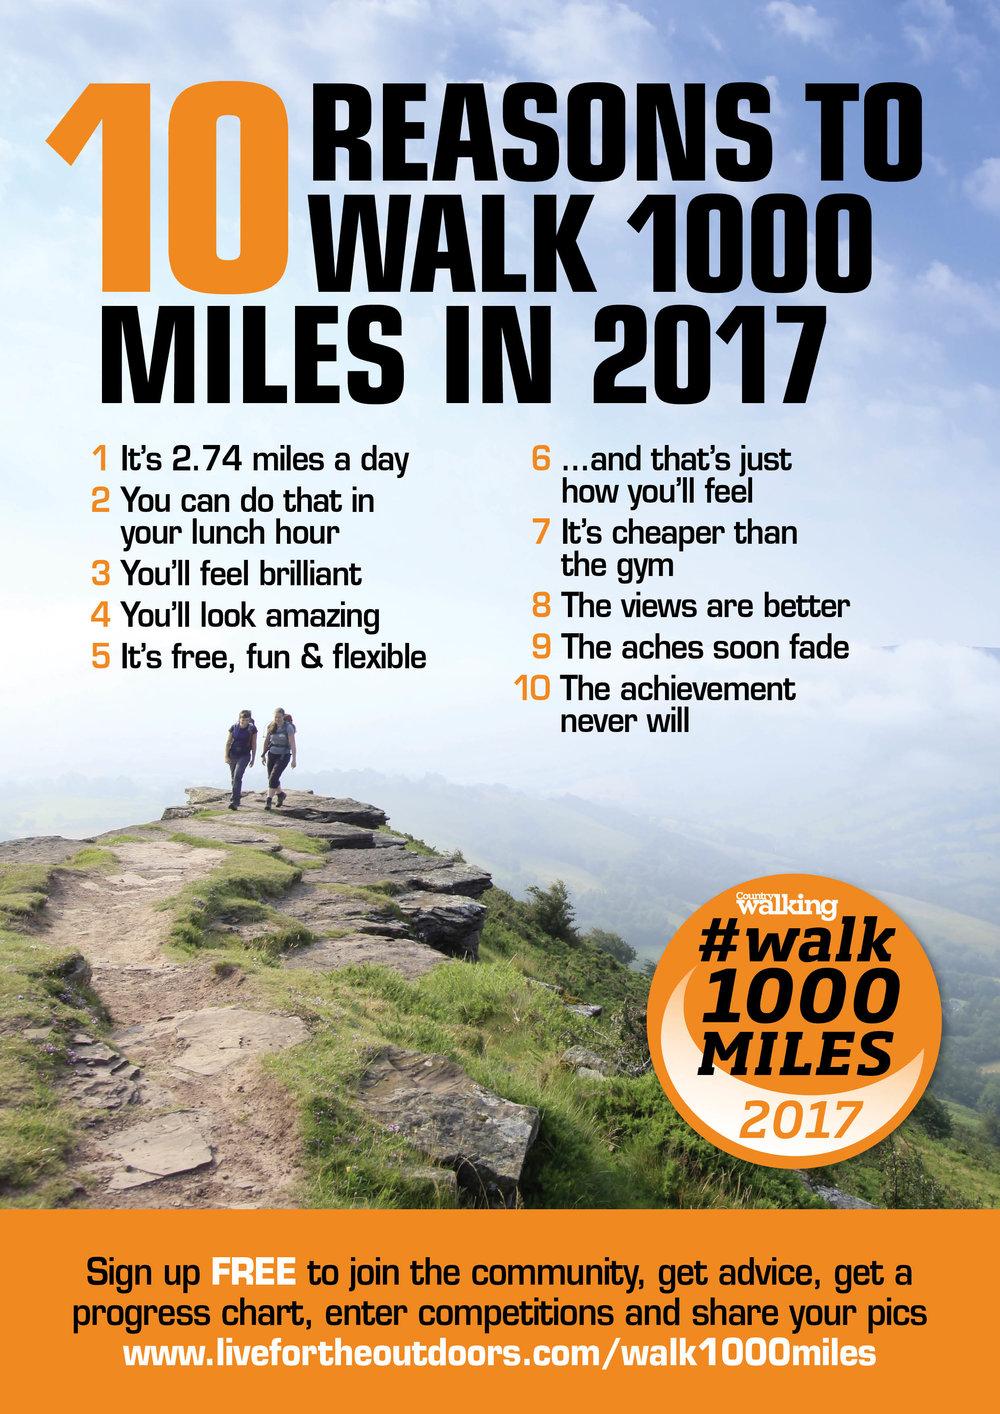 #walk1000miles 2017 poster4.jpg